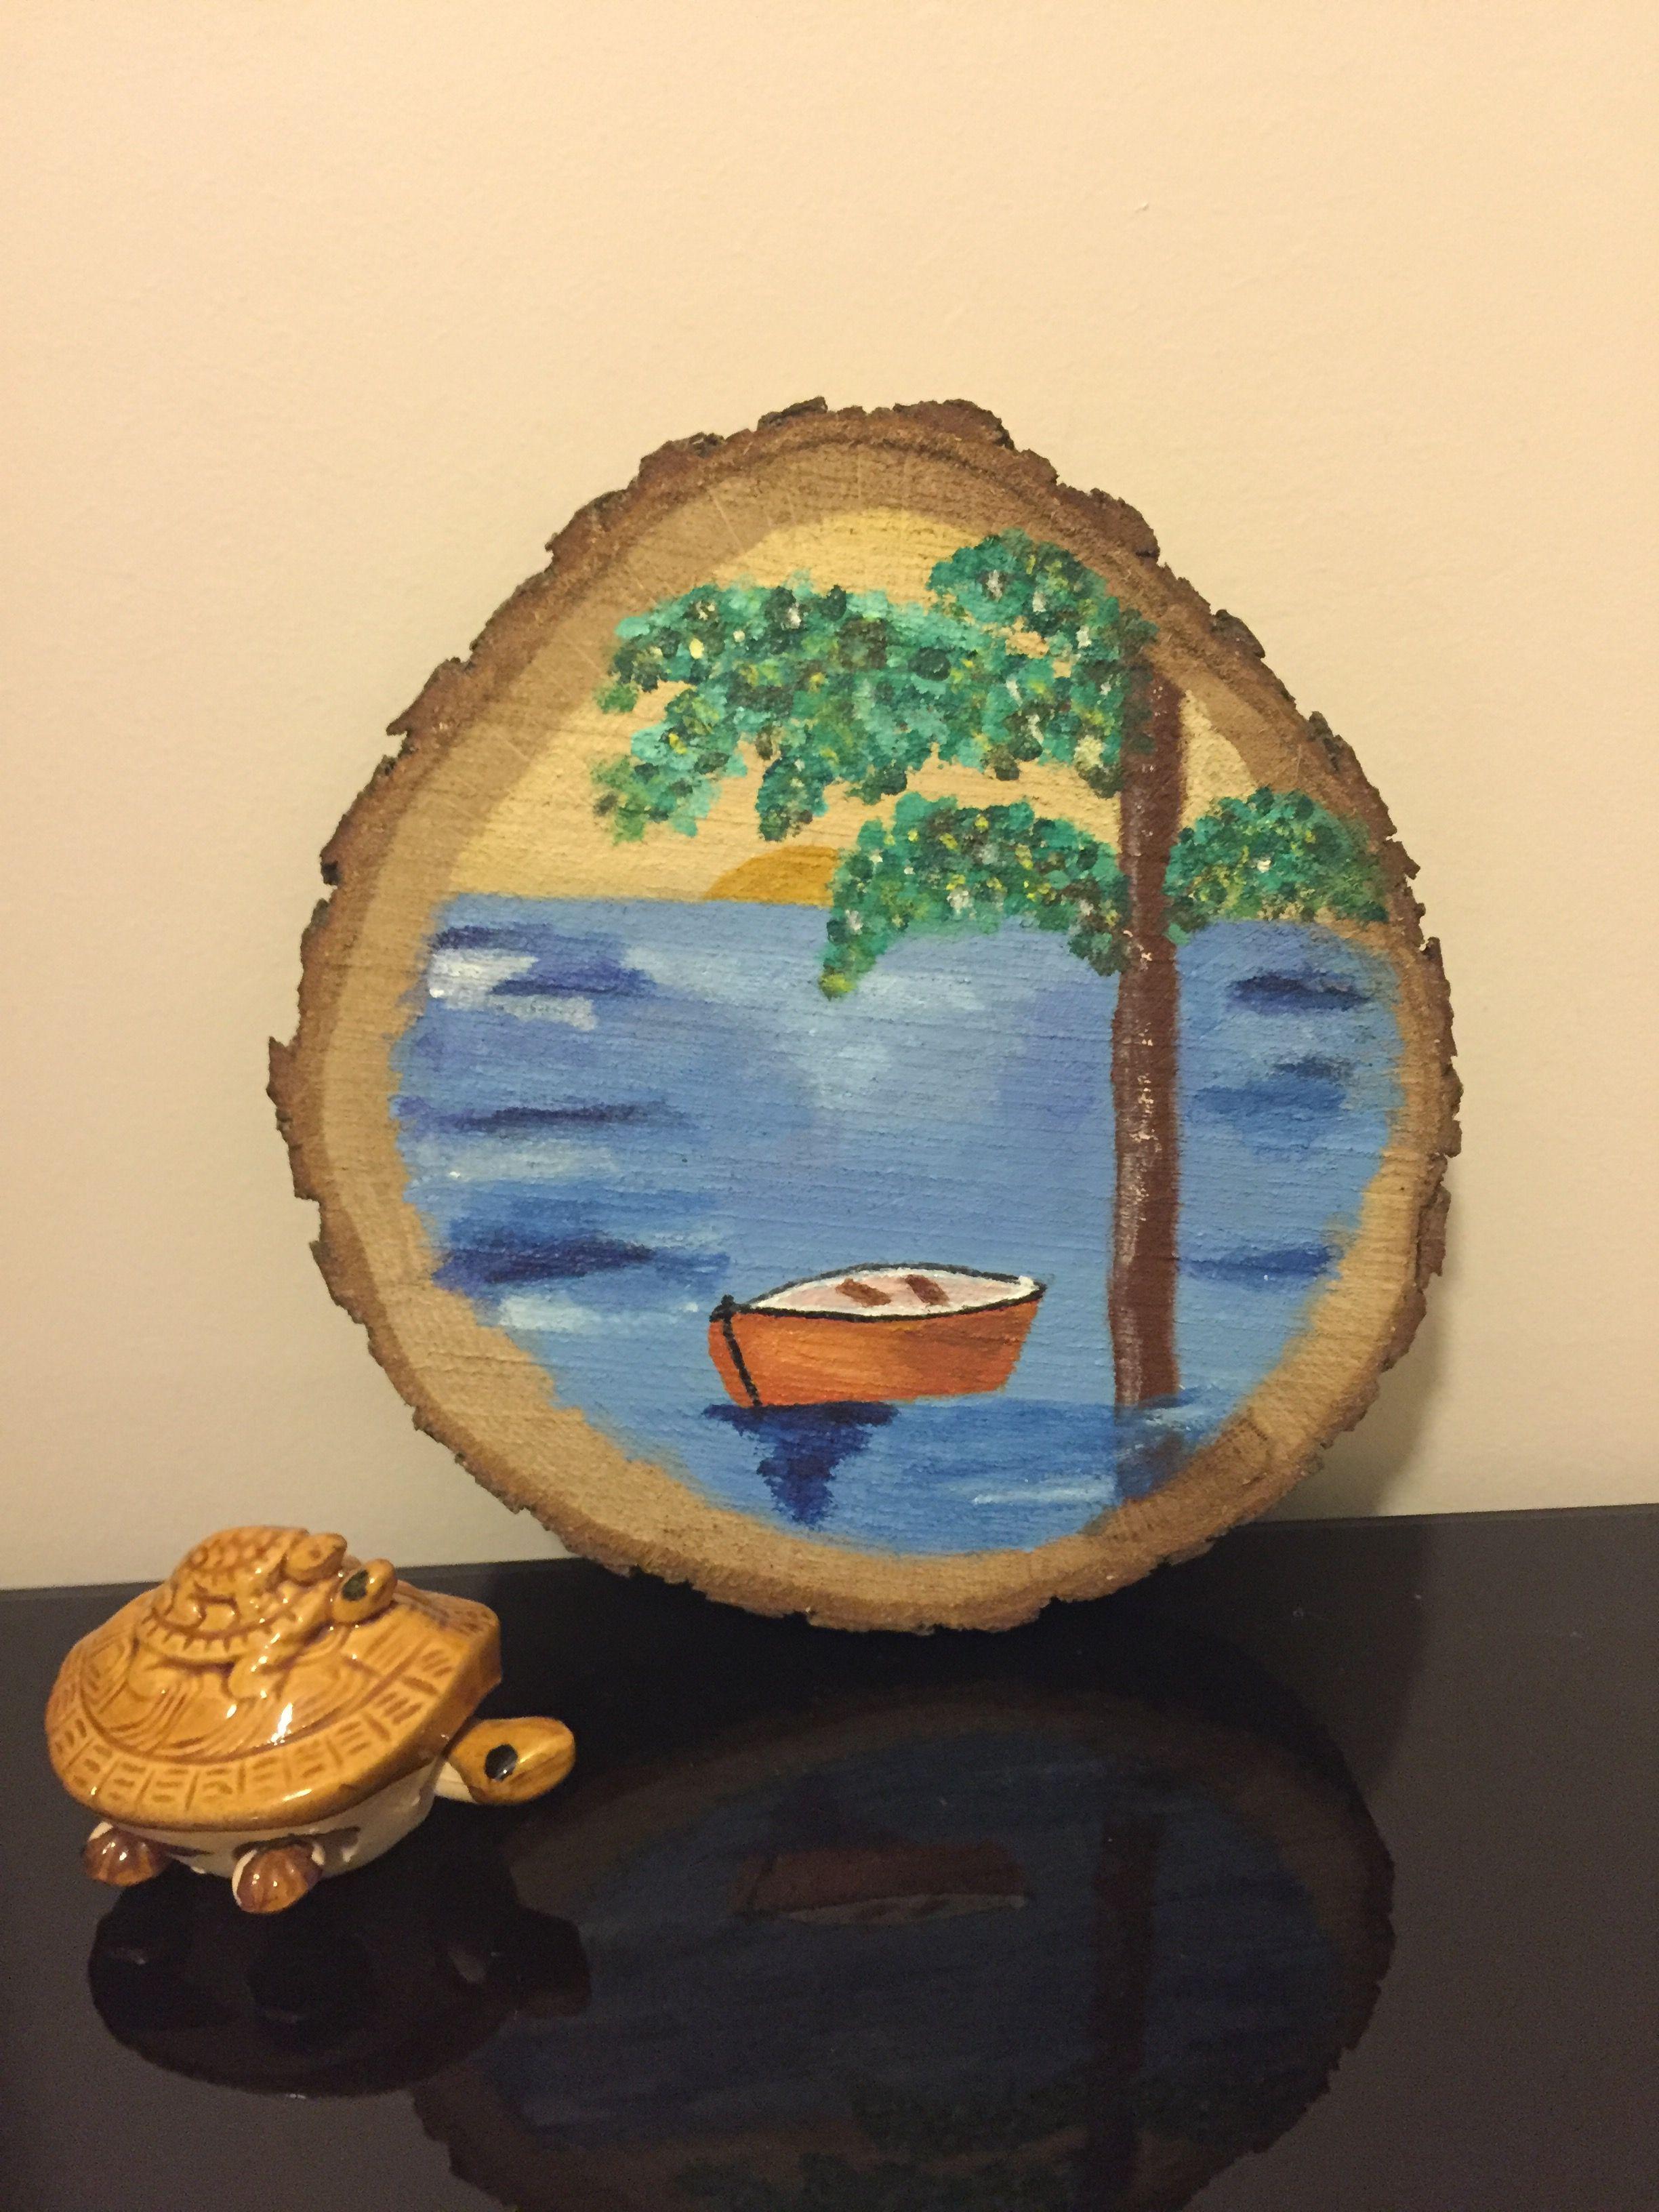 Kutuk Boyama Suluboya Sanati Sanat Resim